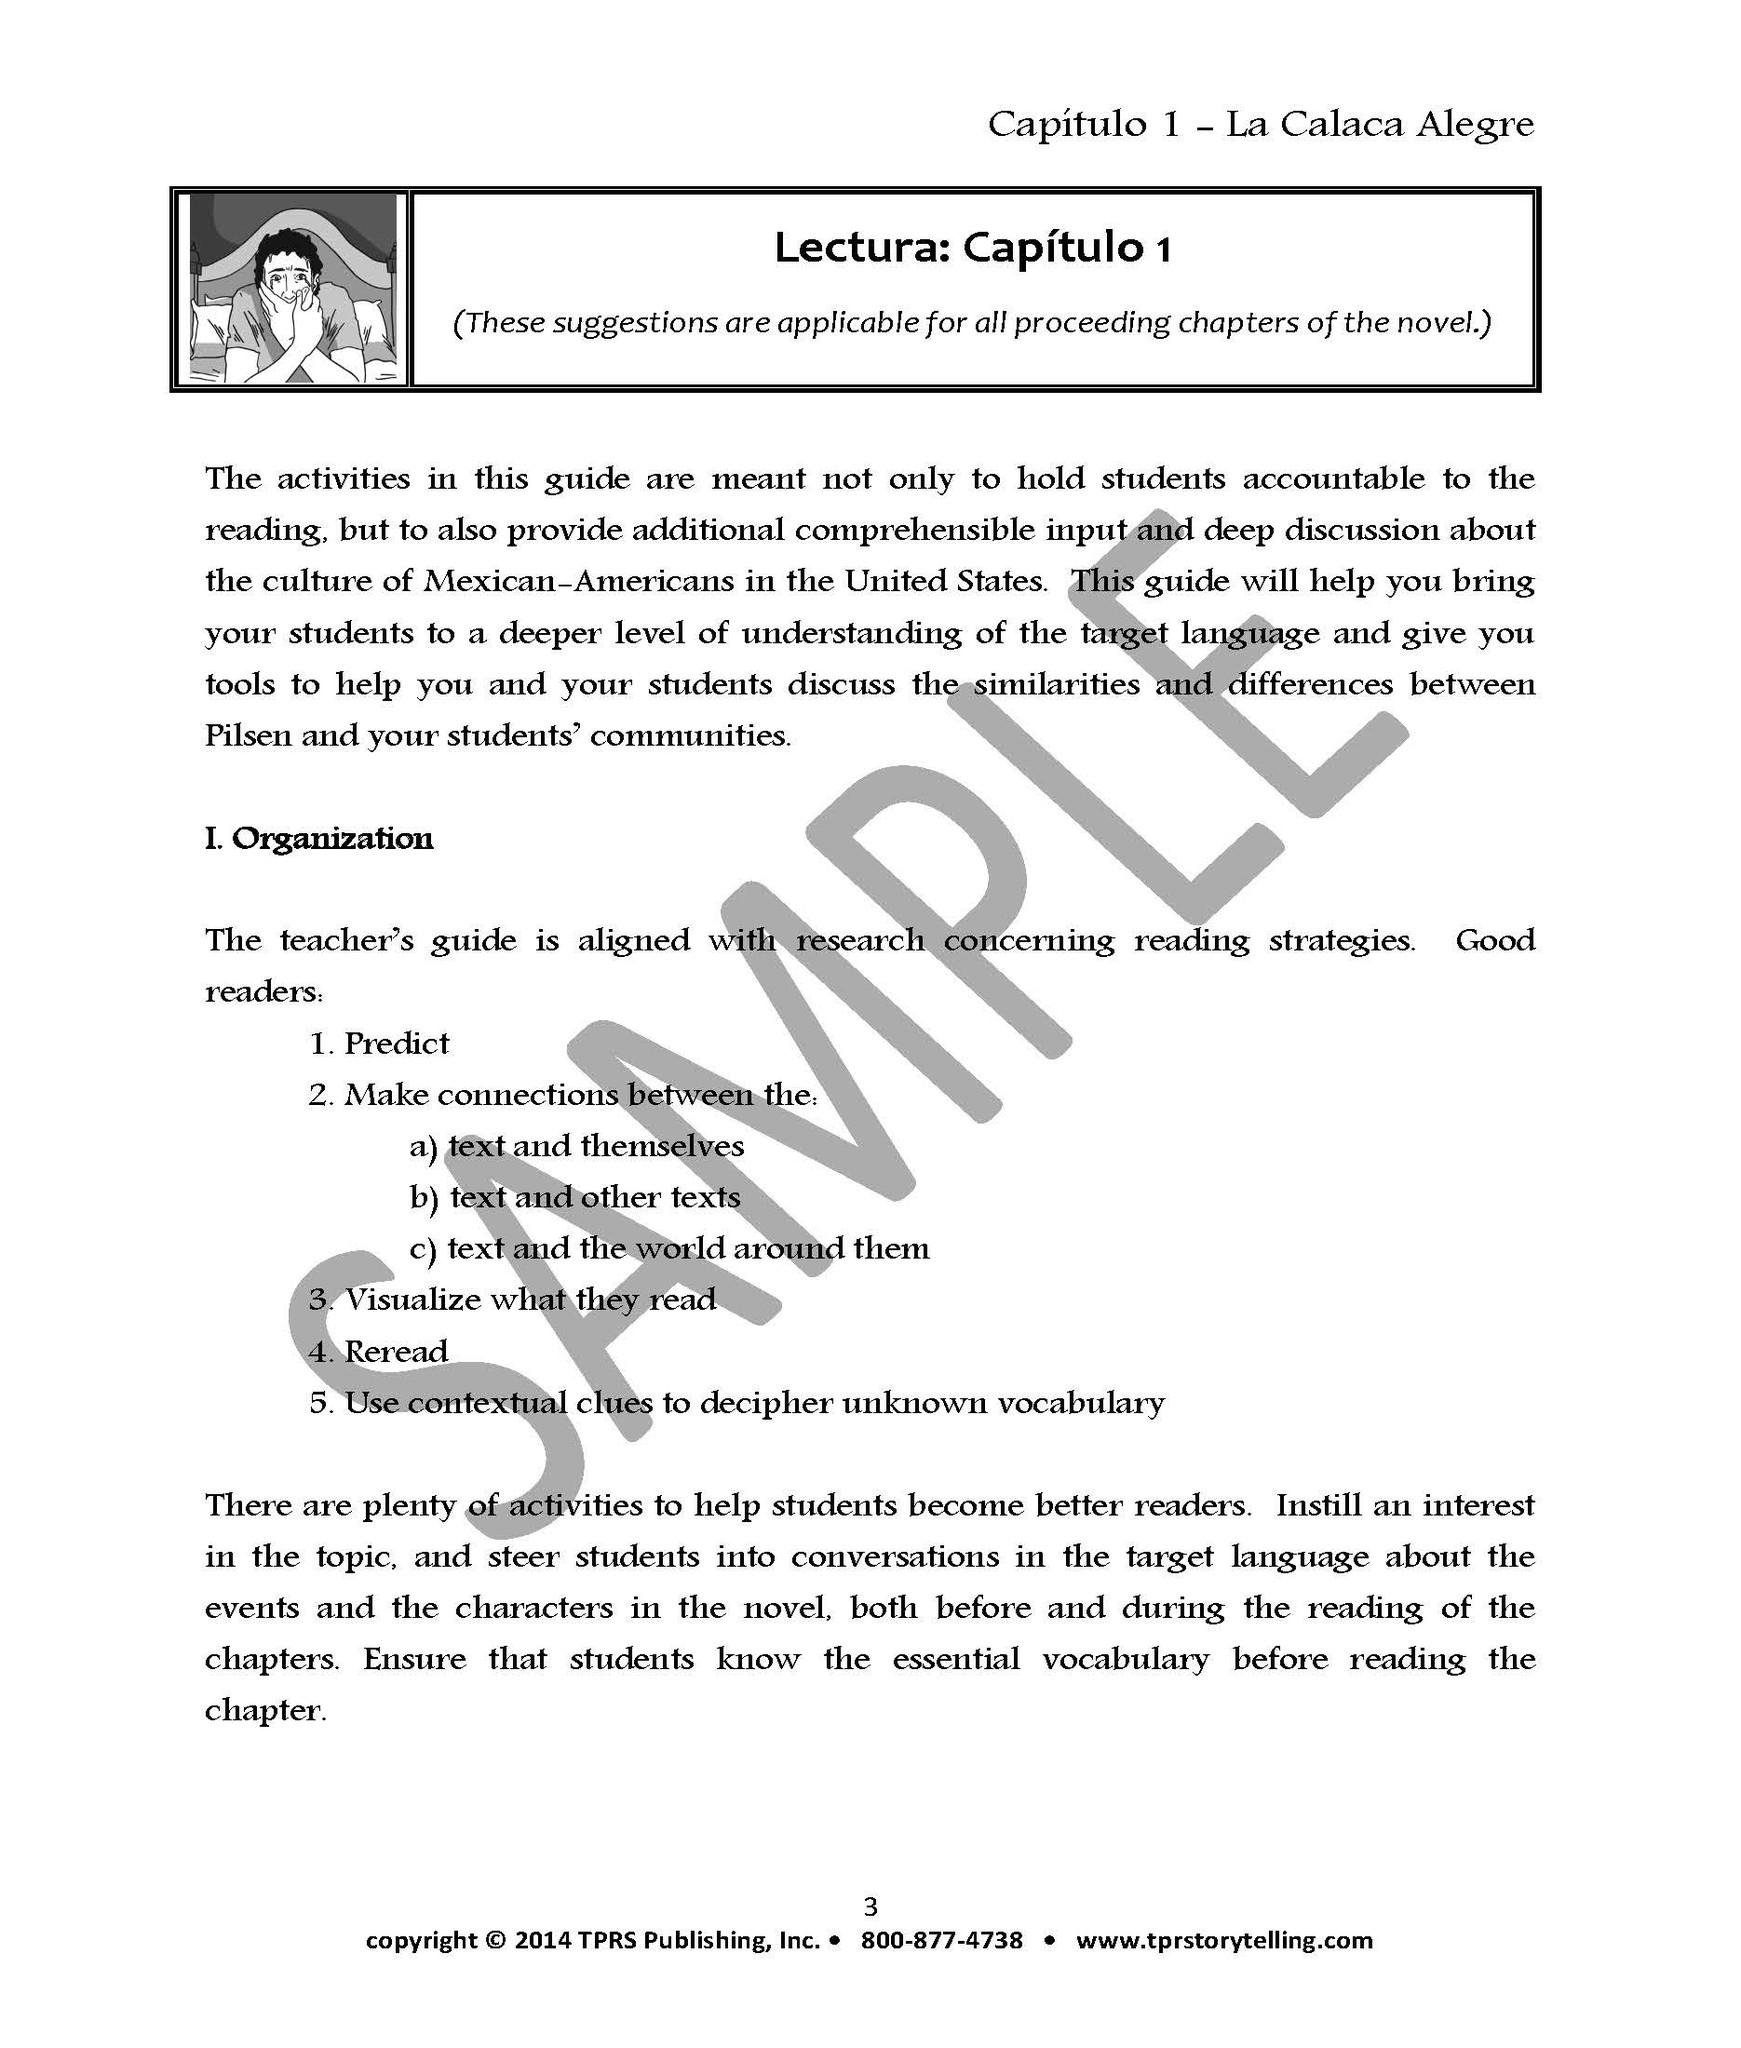 La Calaca Alegre - Teacher's Guide on CD